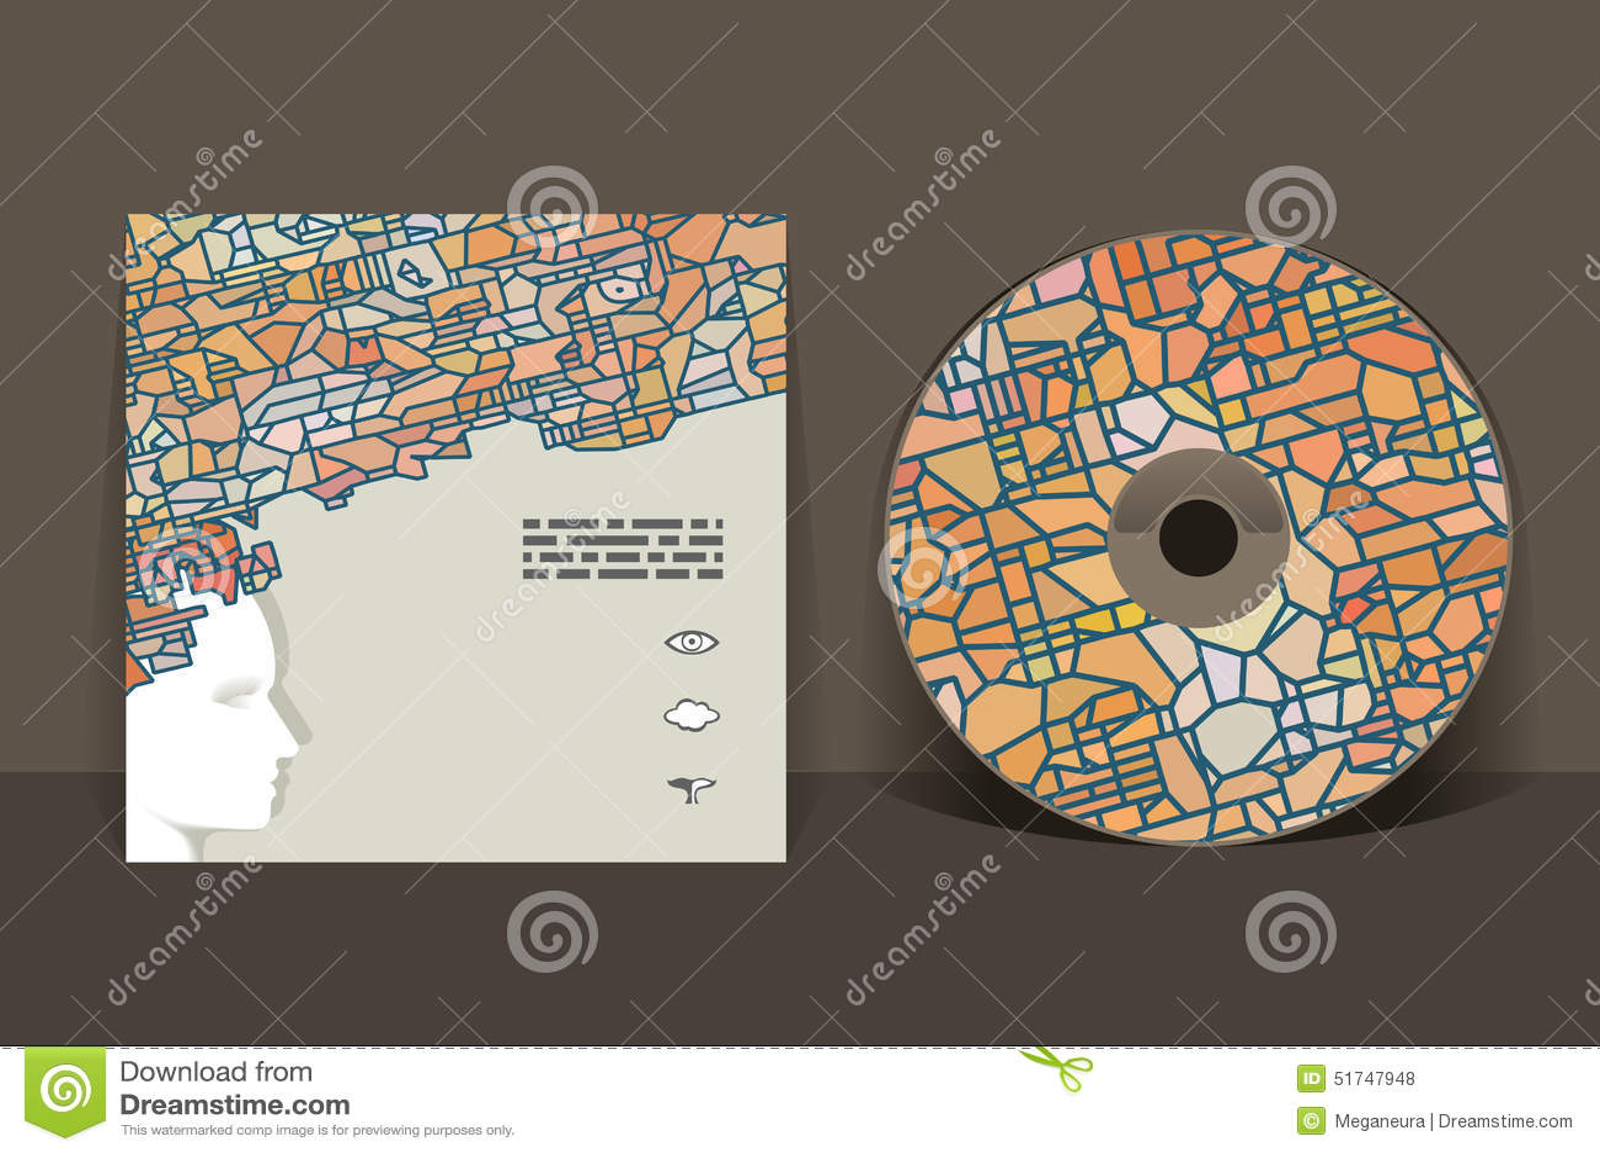 CD cover design template stock vector. Illustration of design - 51747948